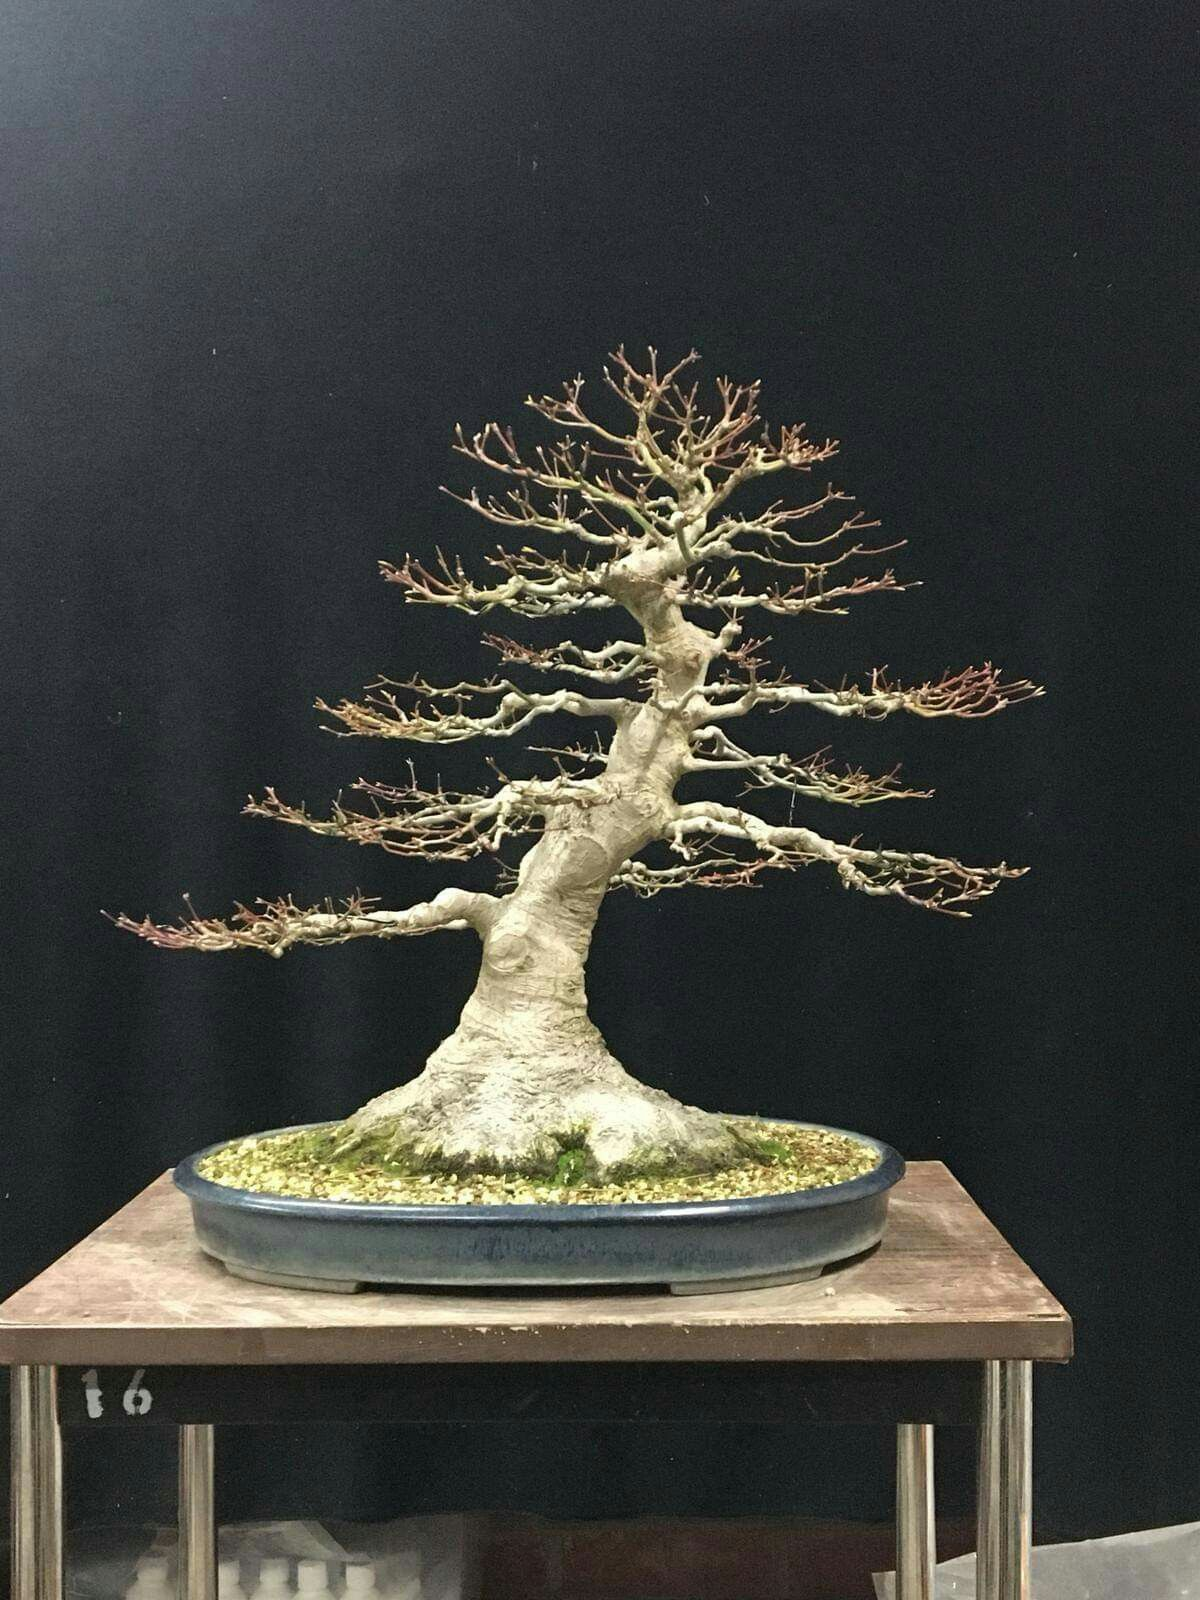 Bonsai Tree With Images Maple Bonsai Bonsai Tree Bonsai